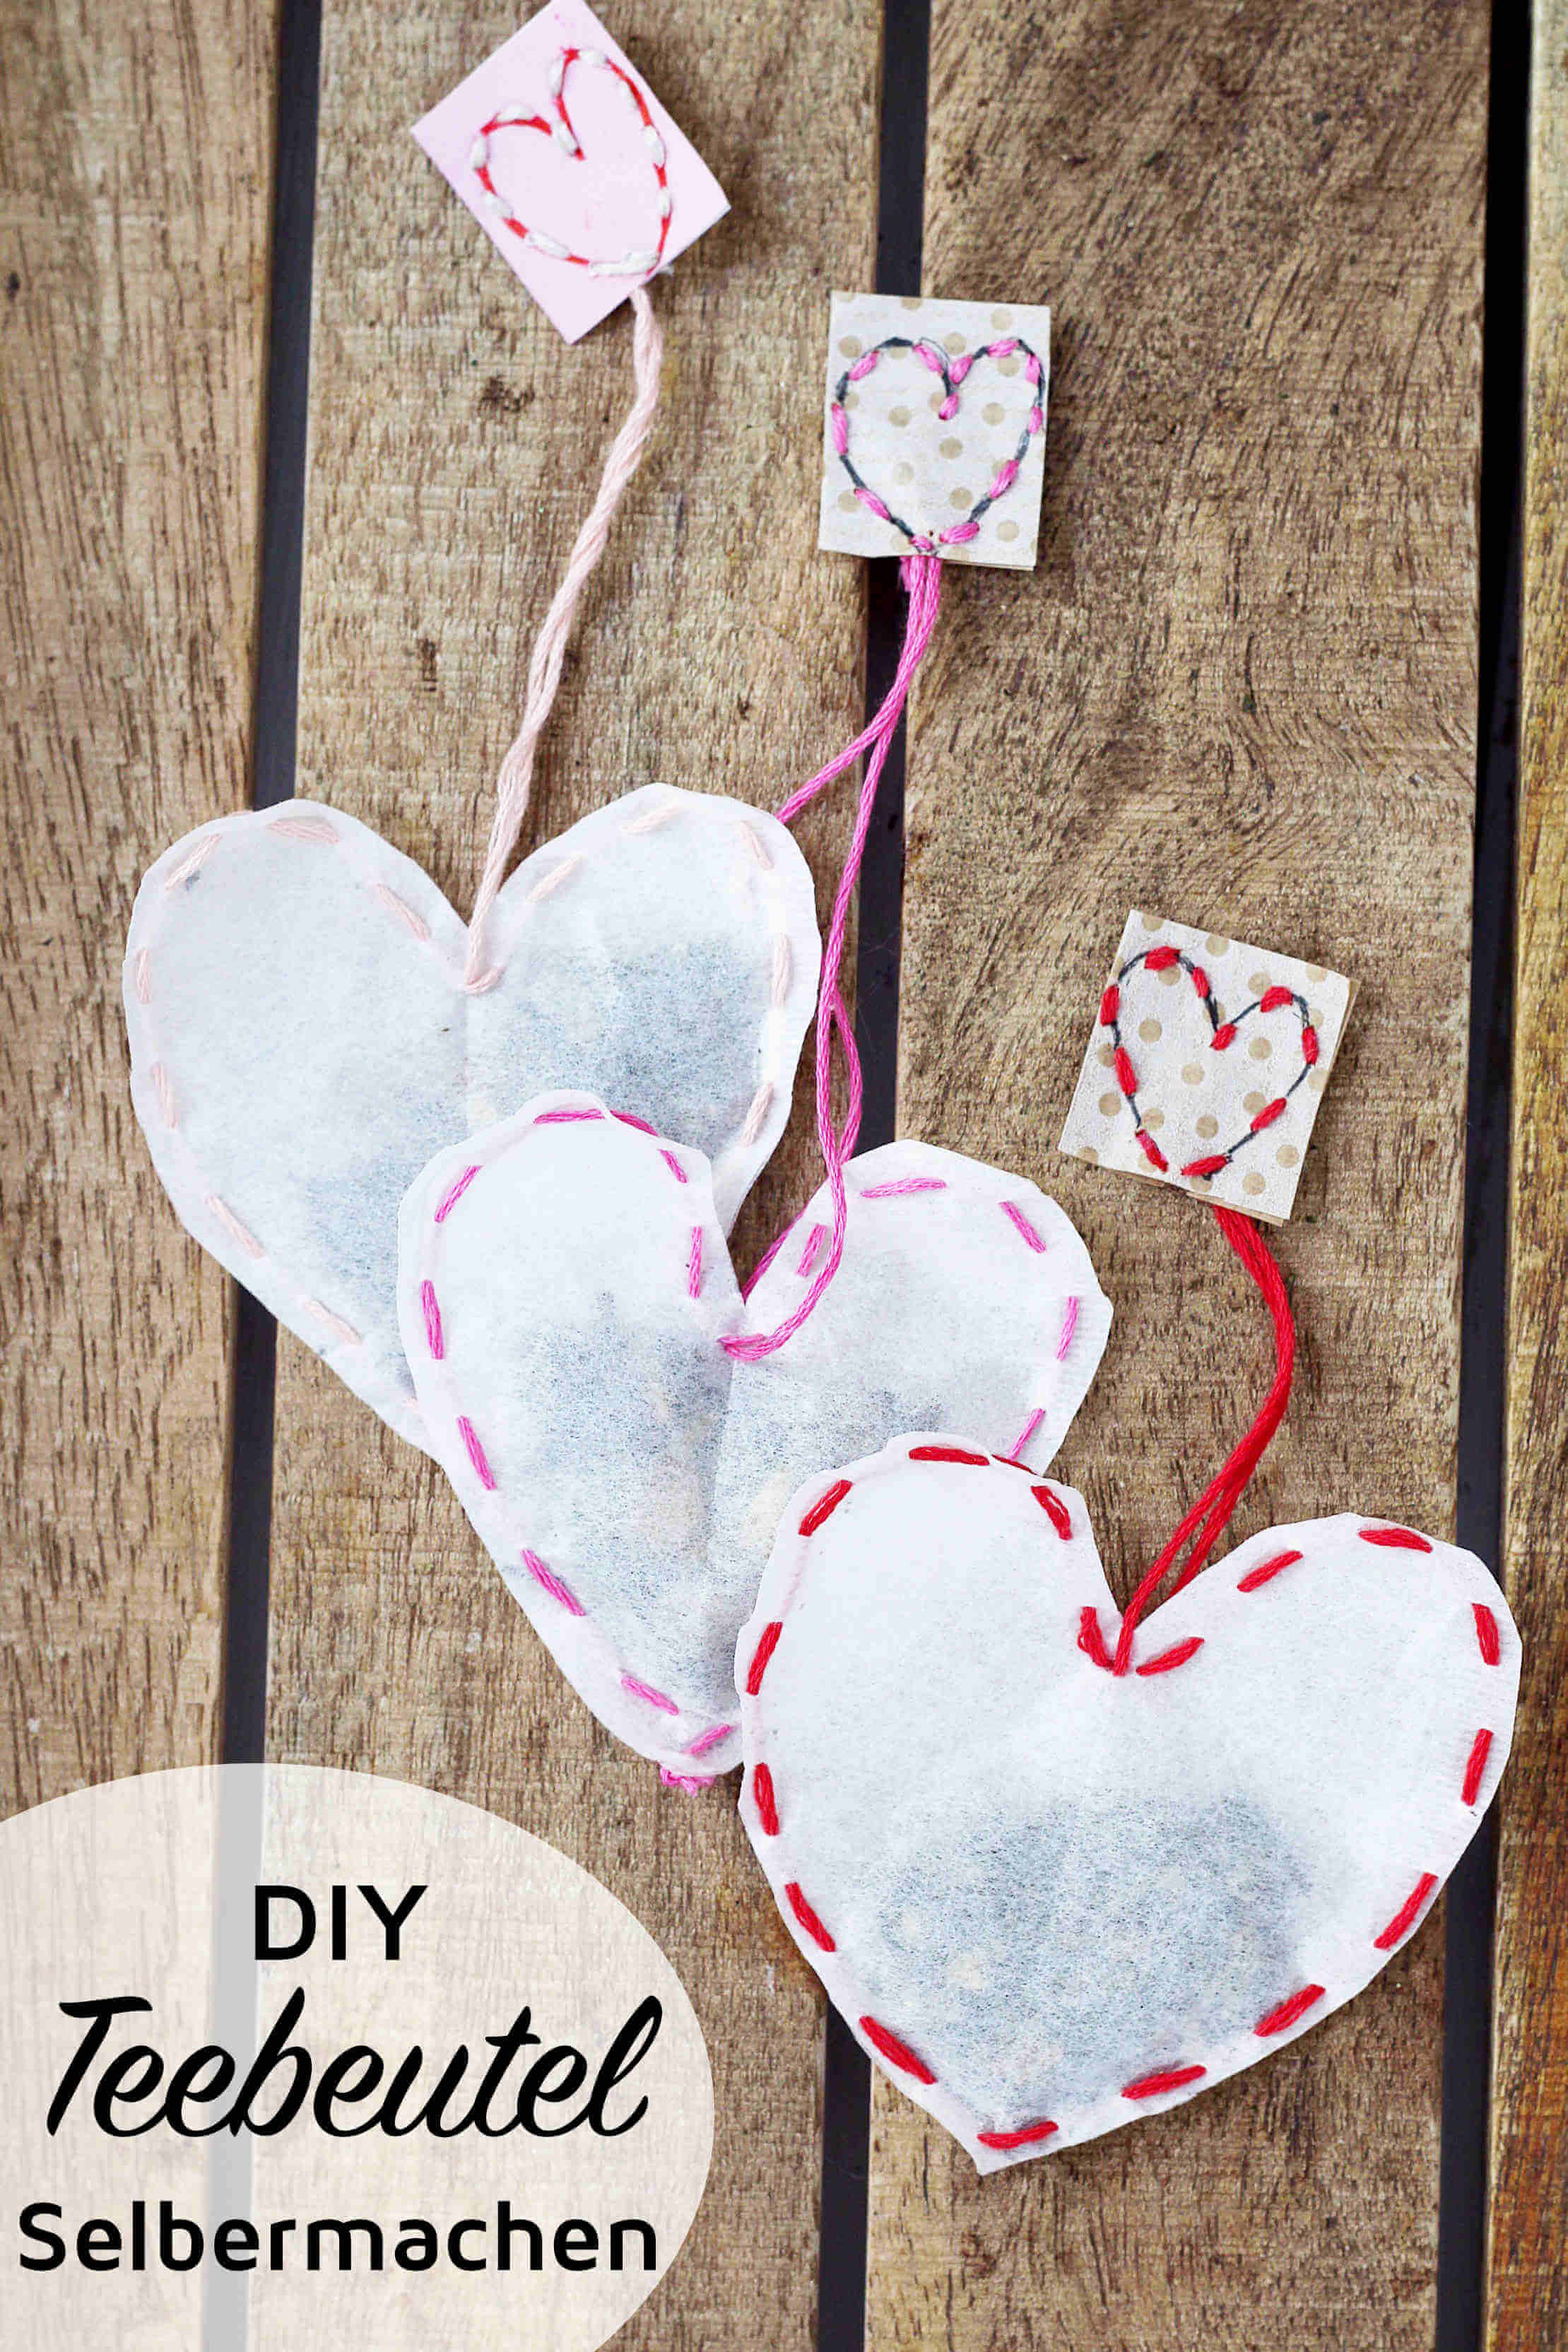 diy-teebeutel-selbermachen-geschenk-geschenkidee-weihnachten-diy-blog